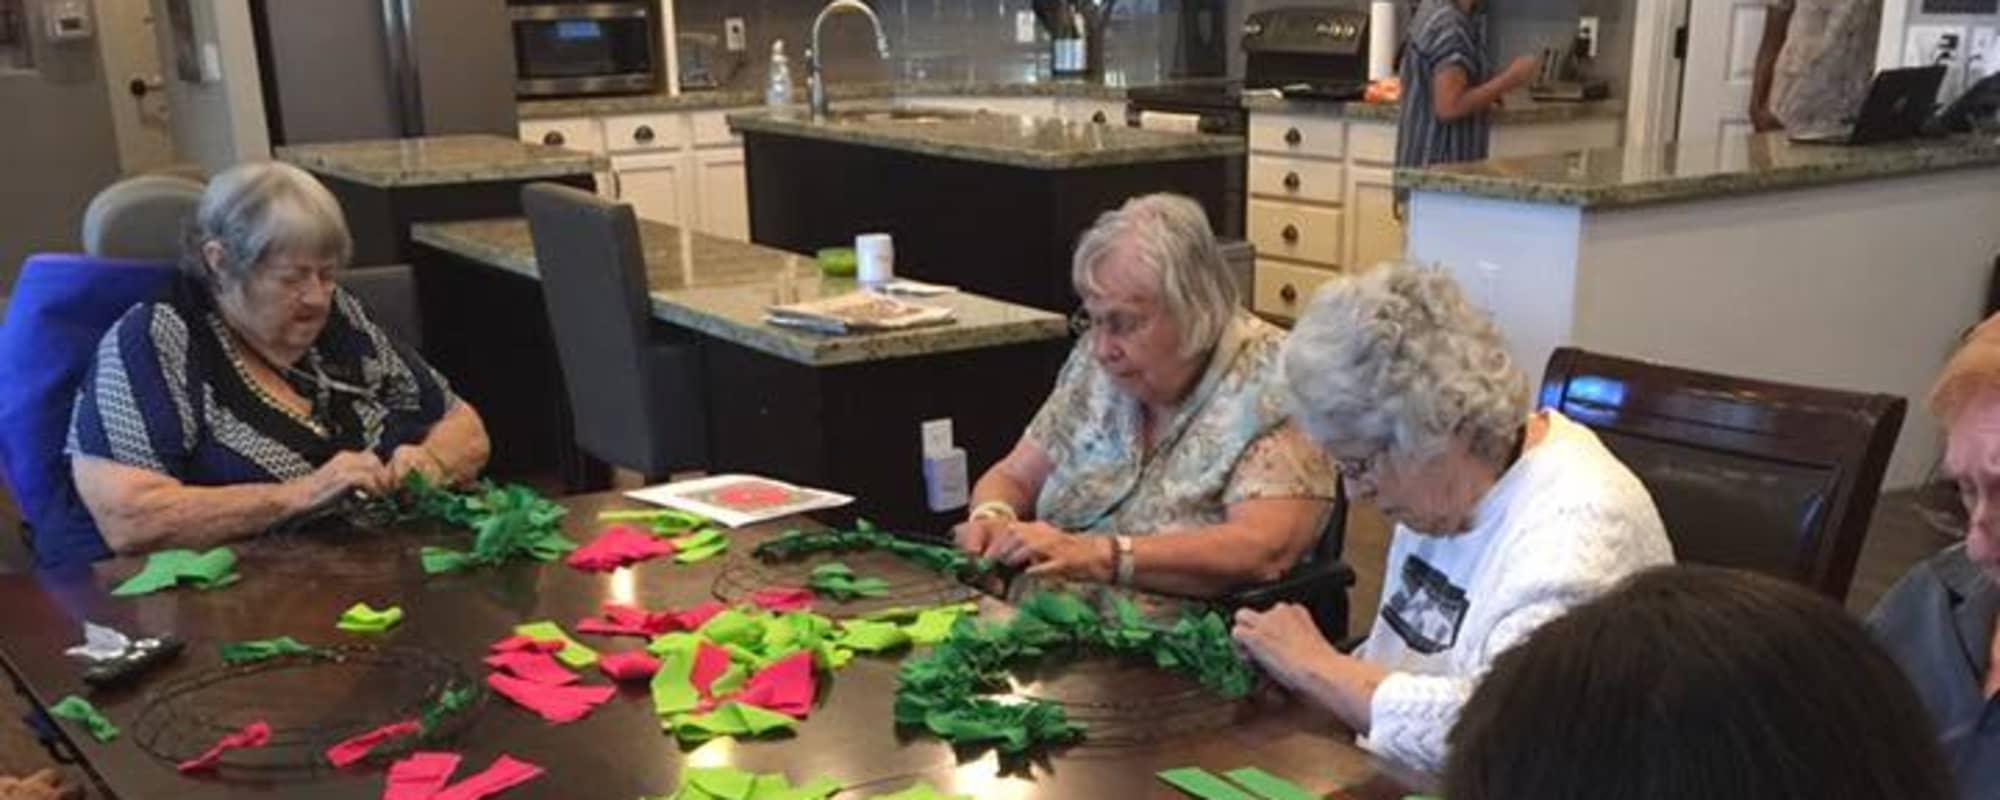 Seniors doing arts and crafts at Hacienda Del Rey in Litchfield Park, Arizona